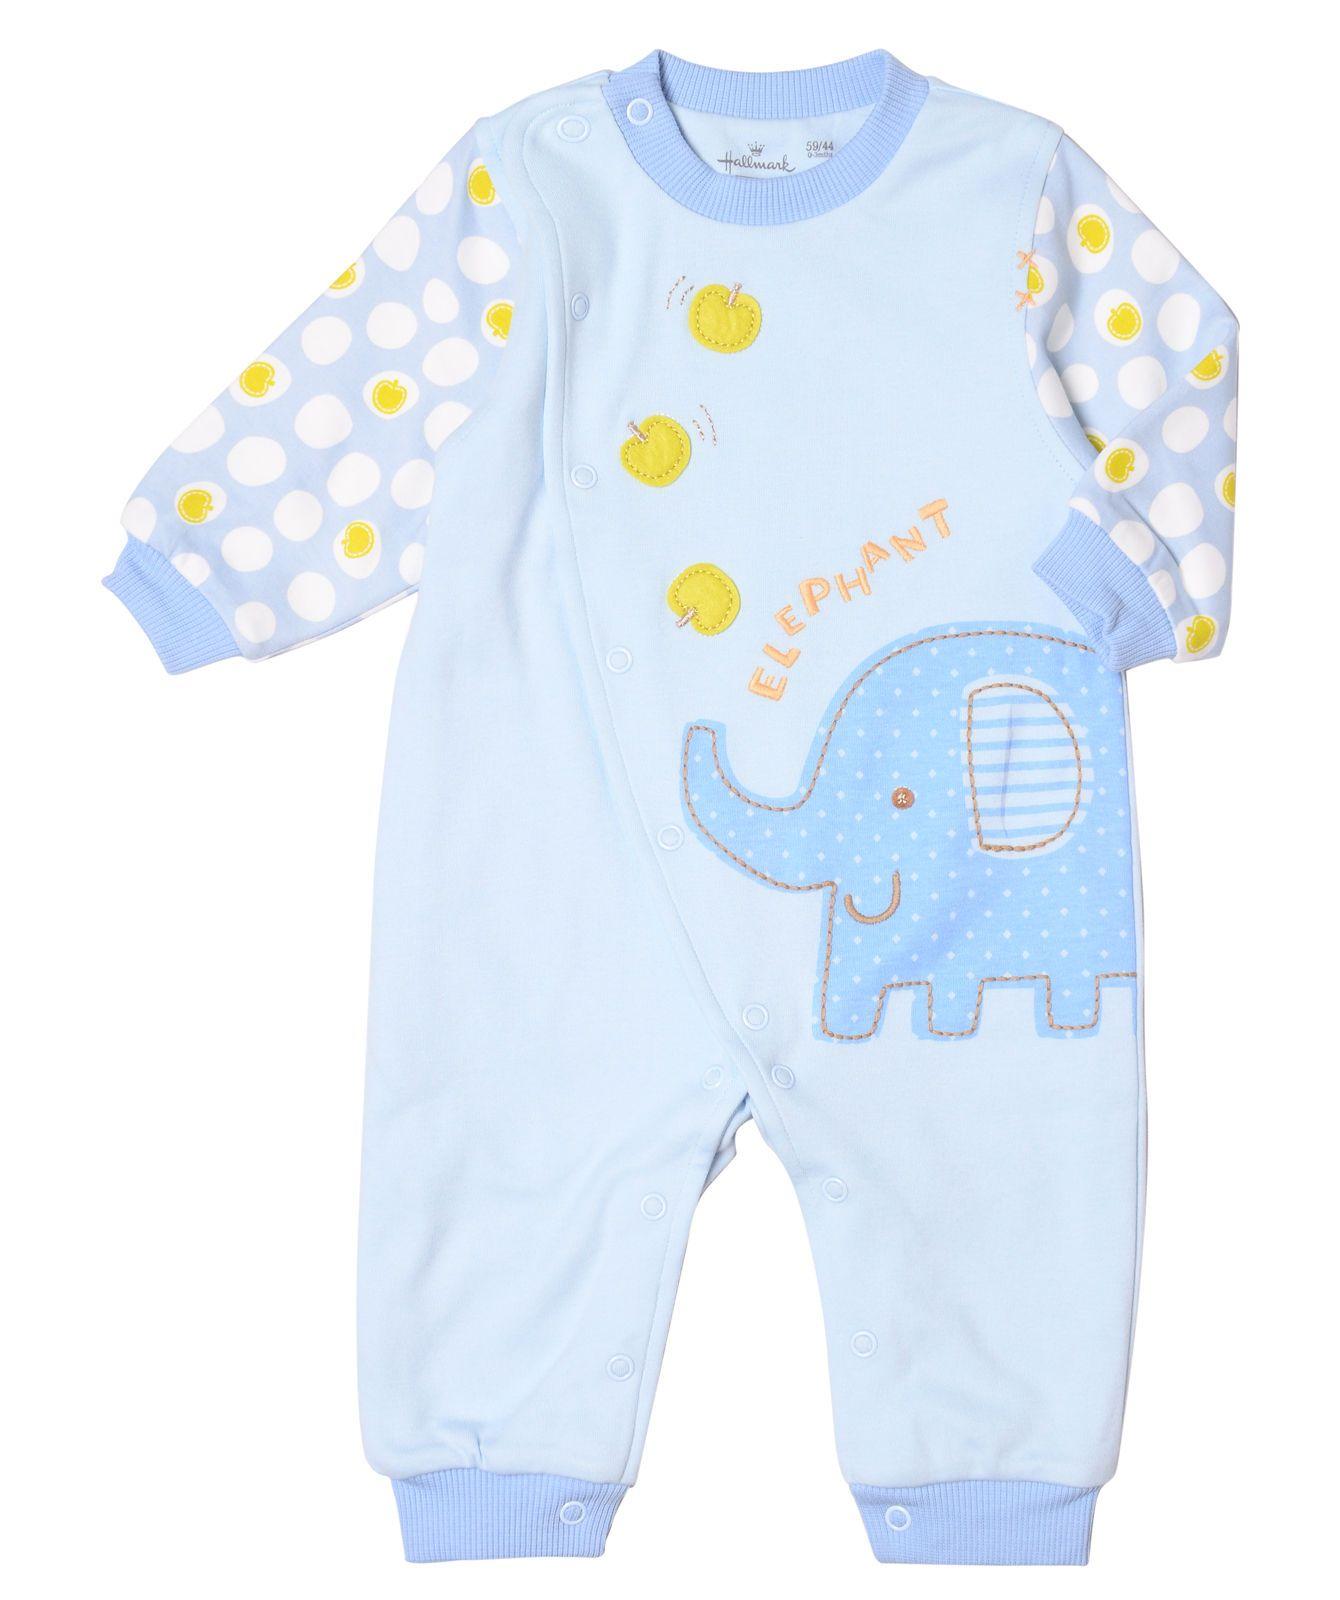 Baby Boy Elephant Fun e Piece – Blue Hallmark Baby